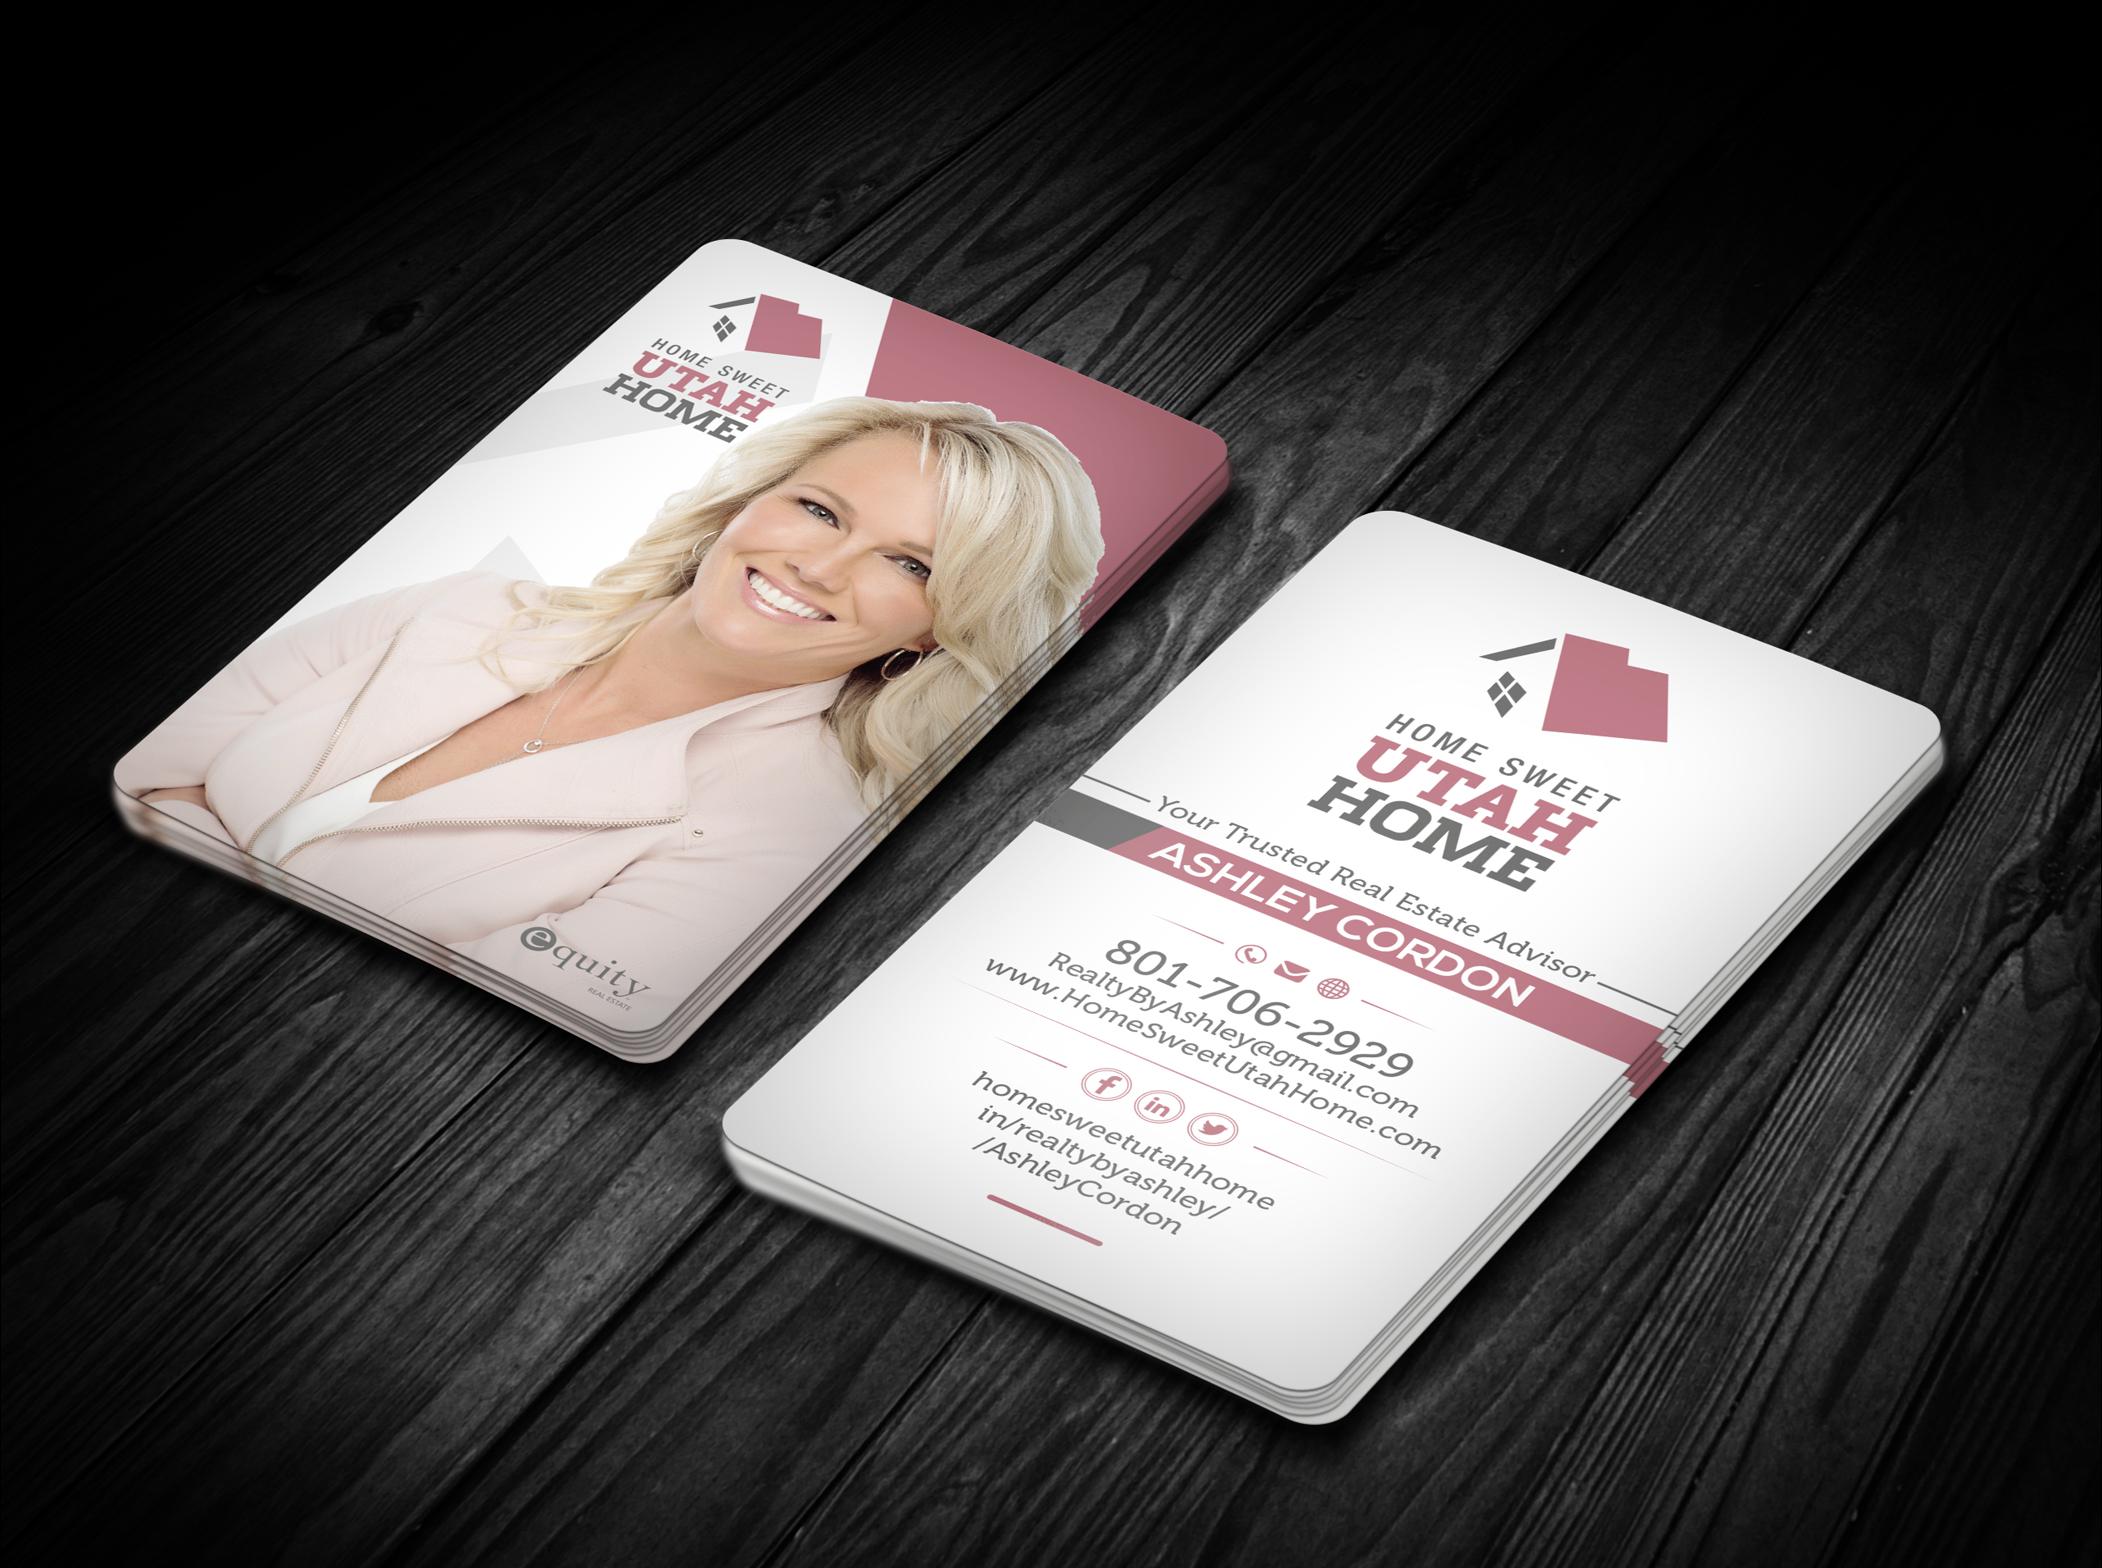 Realtor Business Cards A Logo Identity Project By Realtybyashley